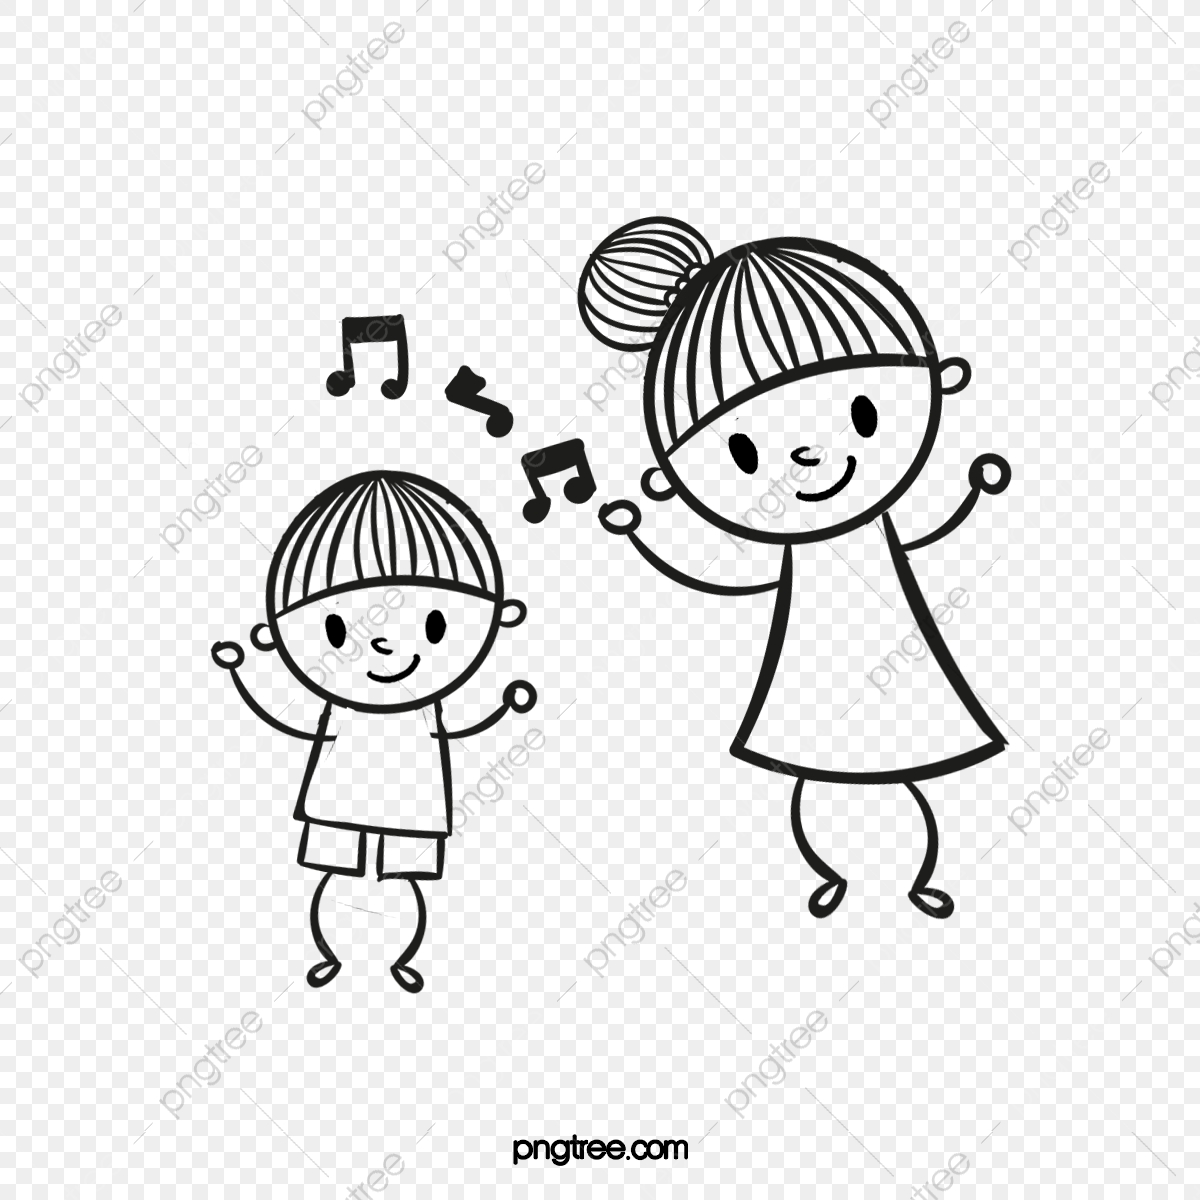 Dancing Kids, Dancing Clipart, Kids Clipart, Dancing PNG Transparent.